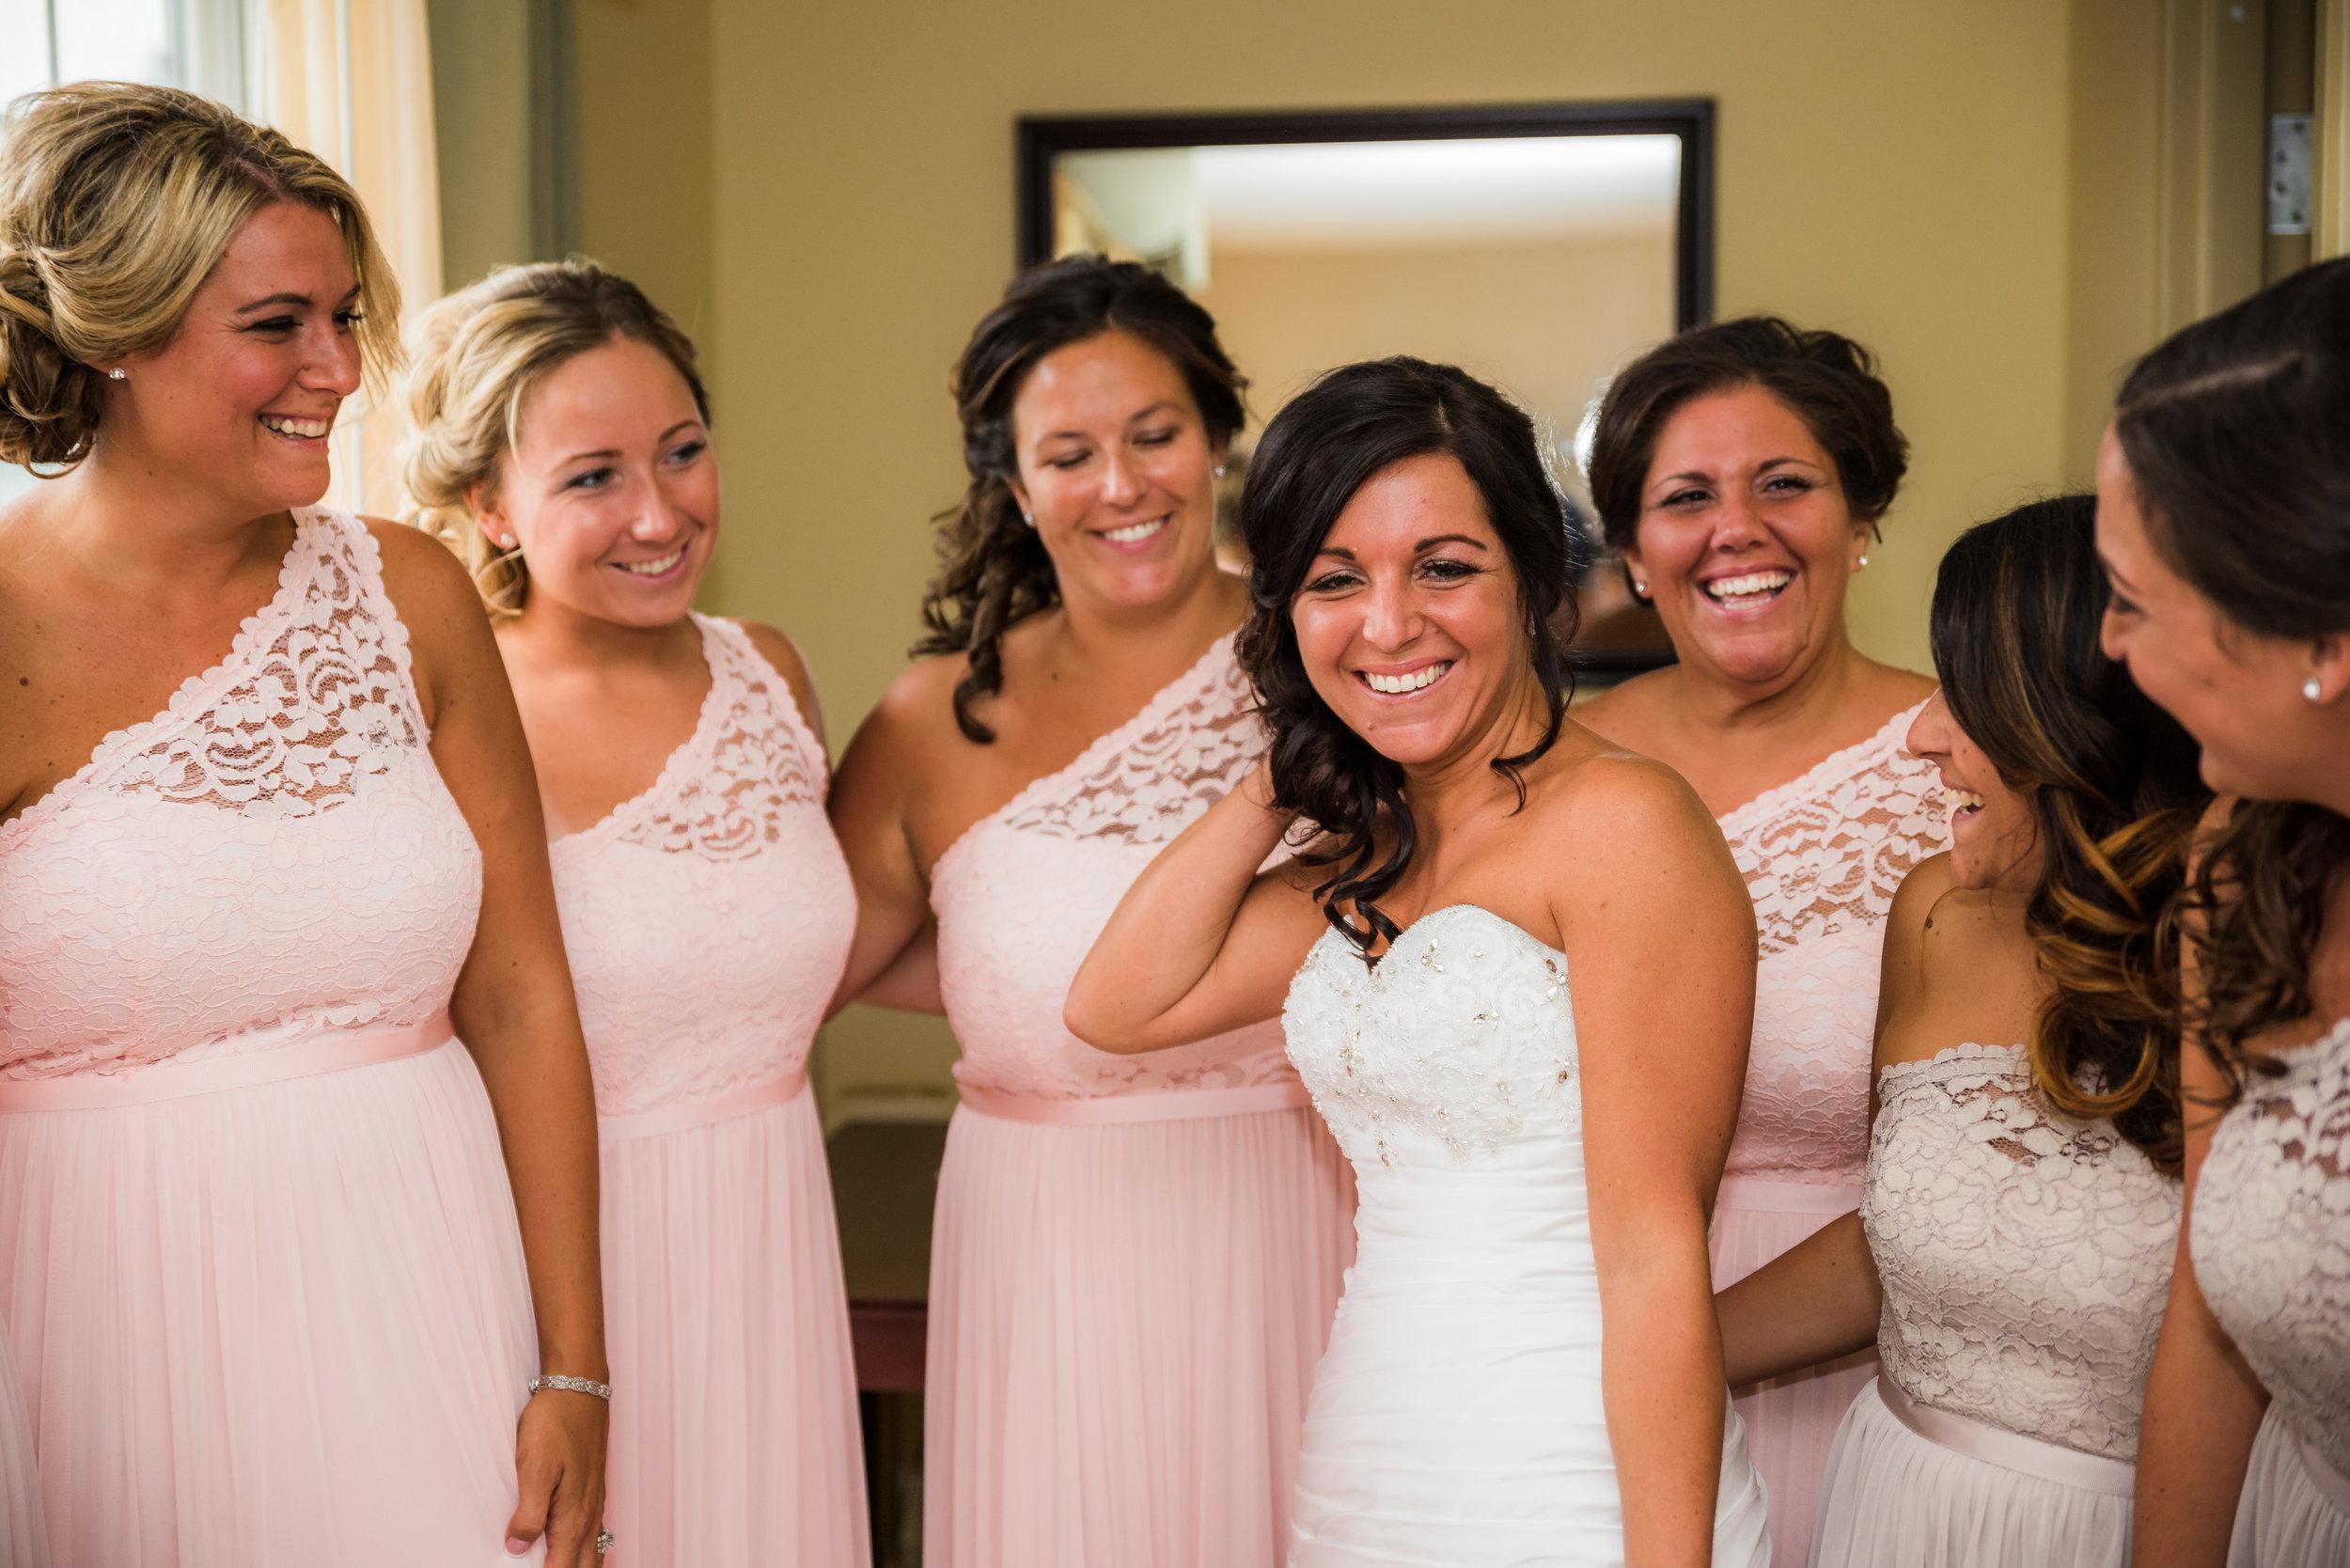 Seaoaks Wedding Photos Steph 3